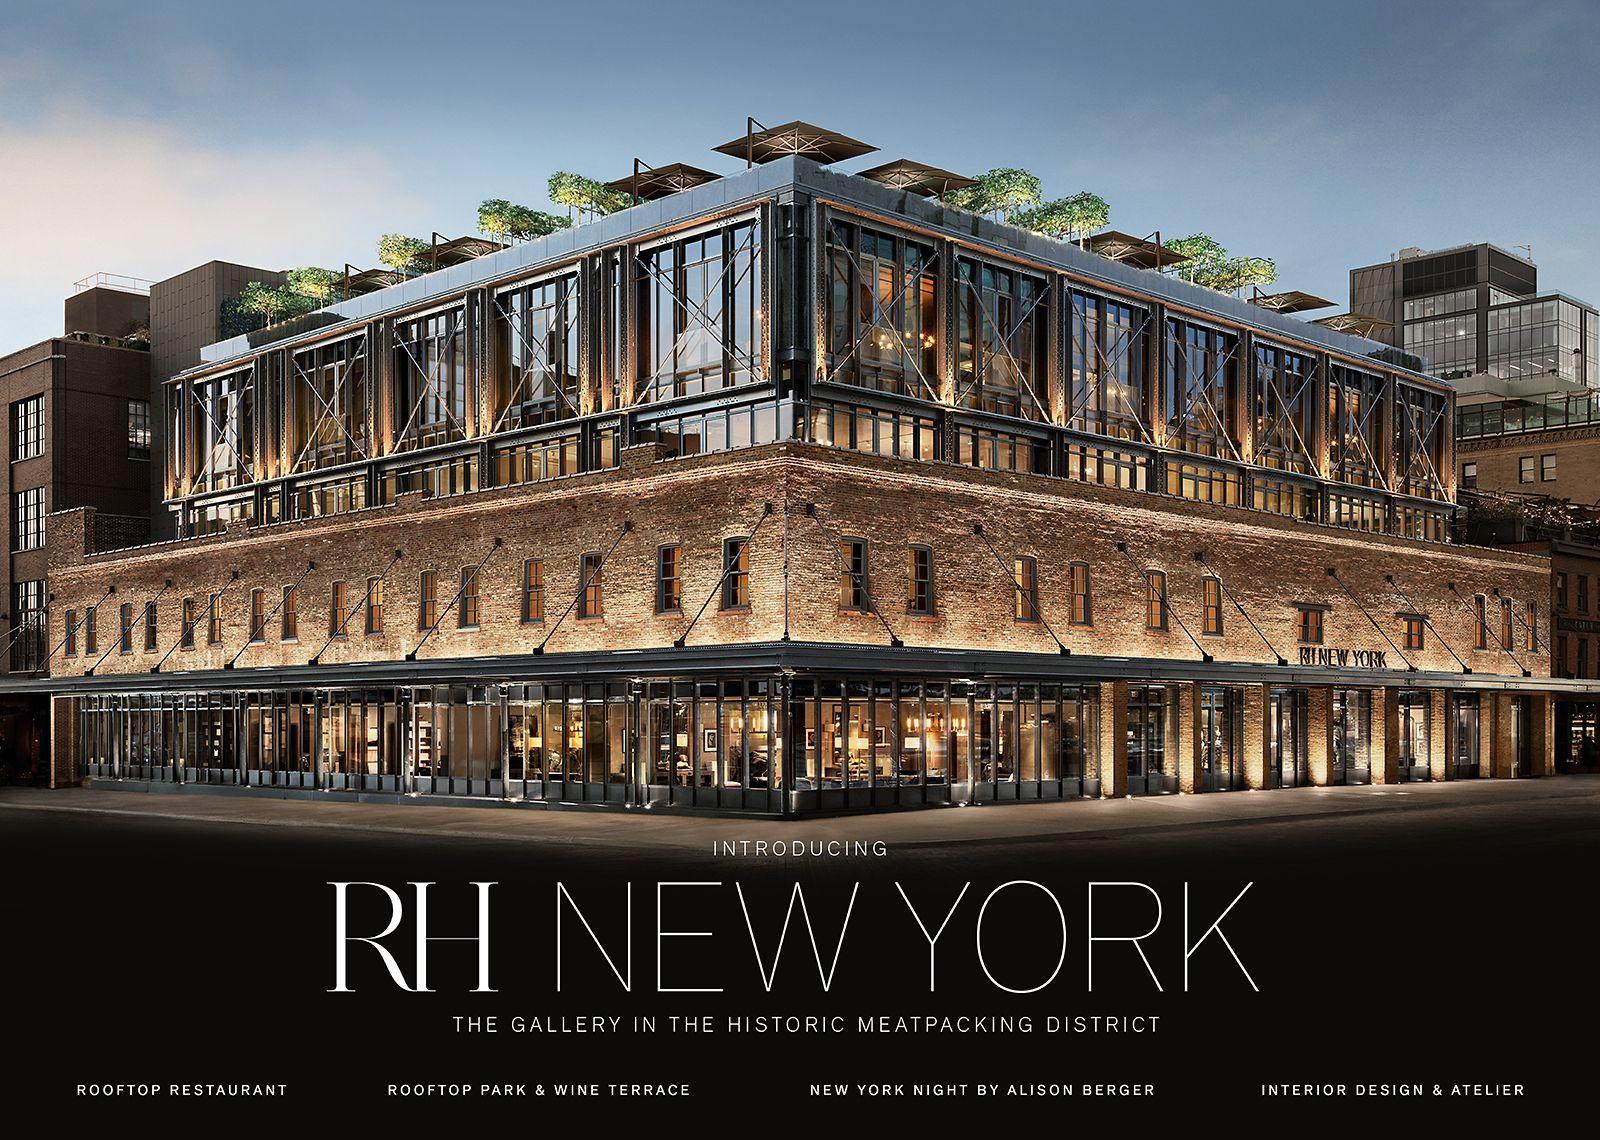 Newyork Rh Restoration Hardware Nyc Restoration Hardware